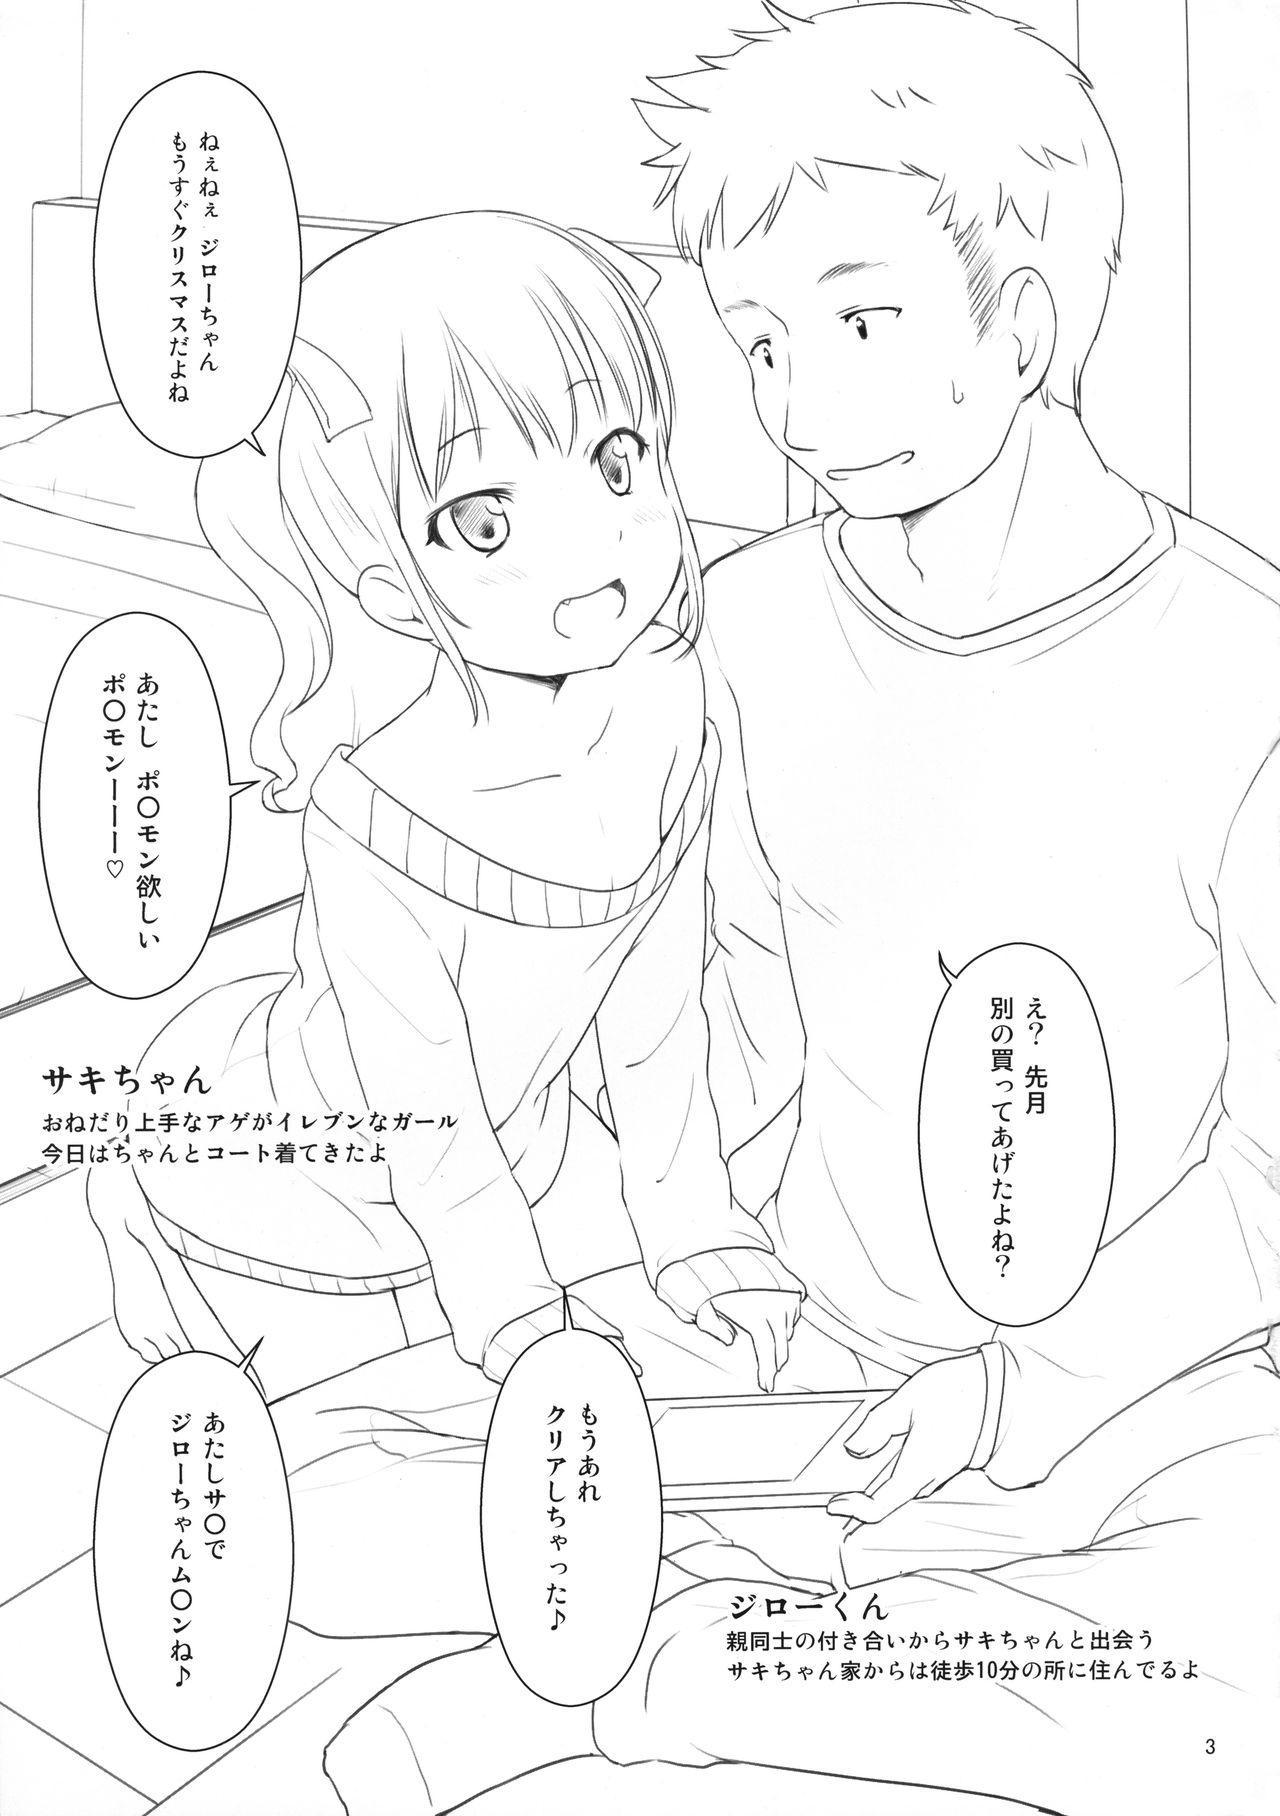 Fuyu no Ho San 2